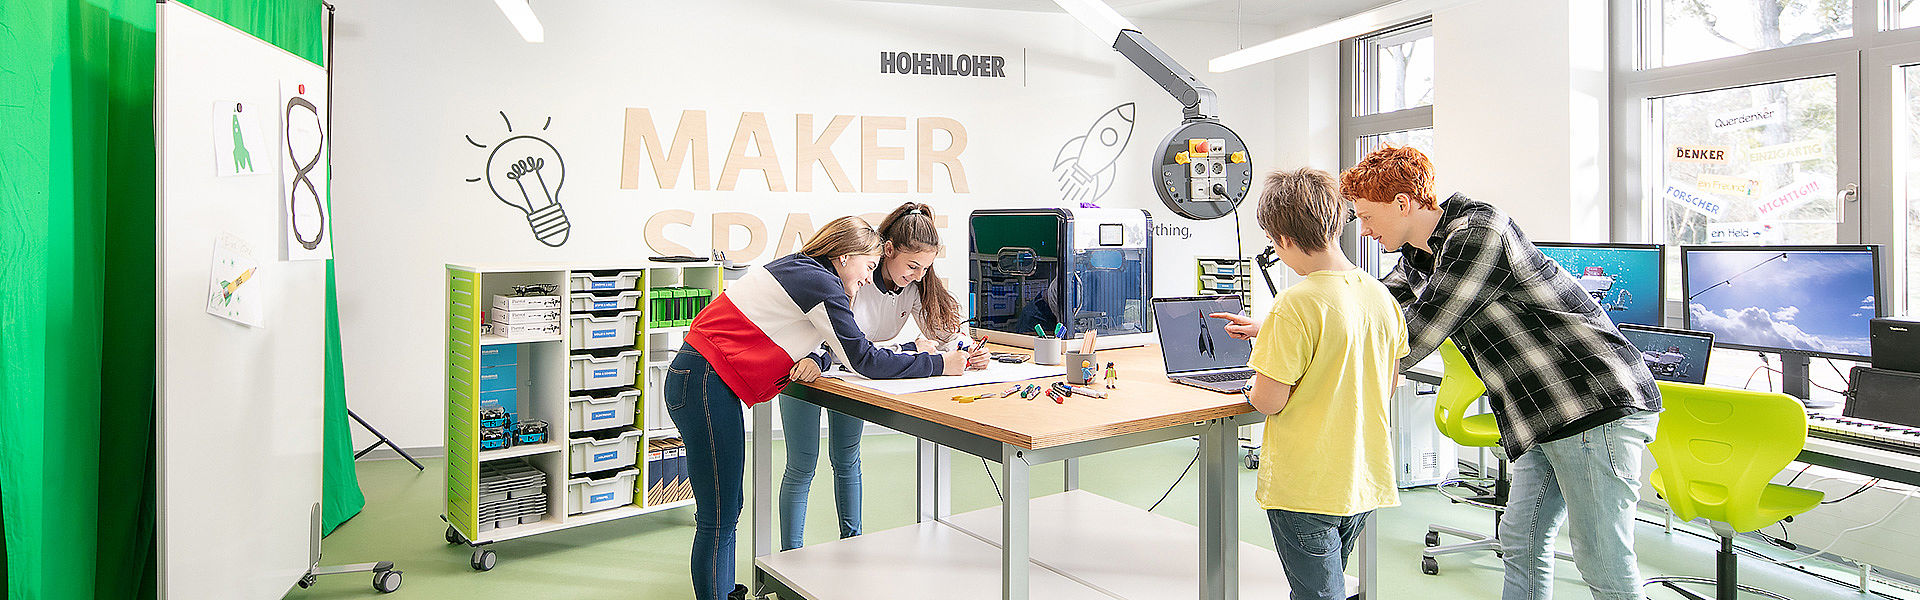 Bild: Academy Hamm - Thema Makerspace